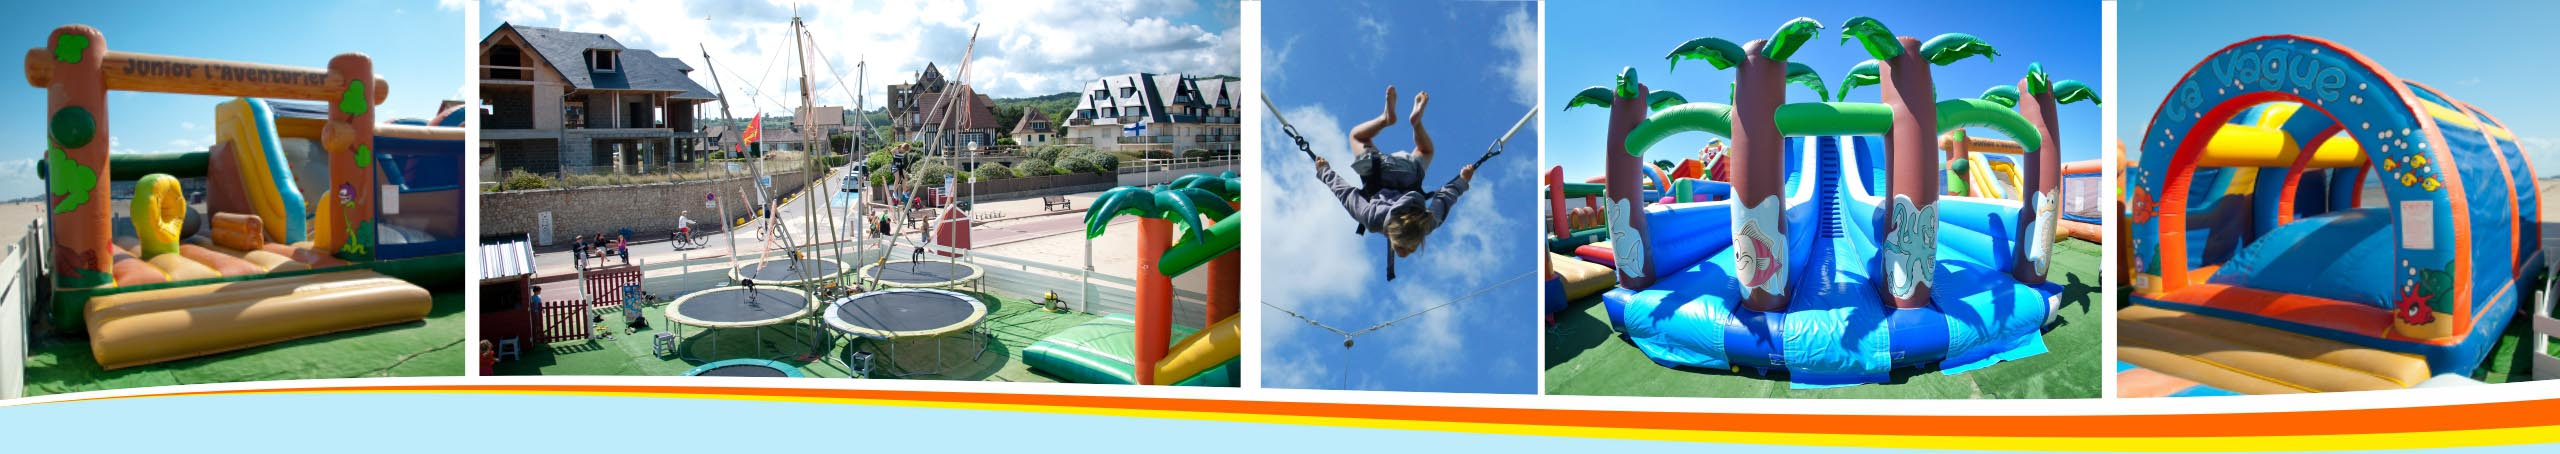 location, location gonflables, attractions, jeux, enfants, structure gonflable, trampoline, vacances, hiver, calvados, normandie